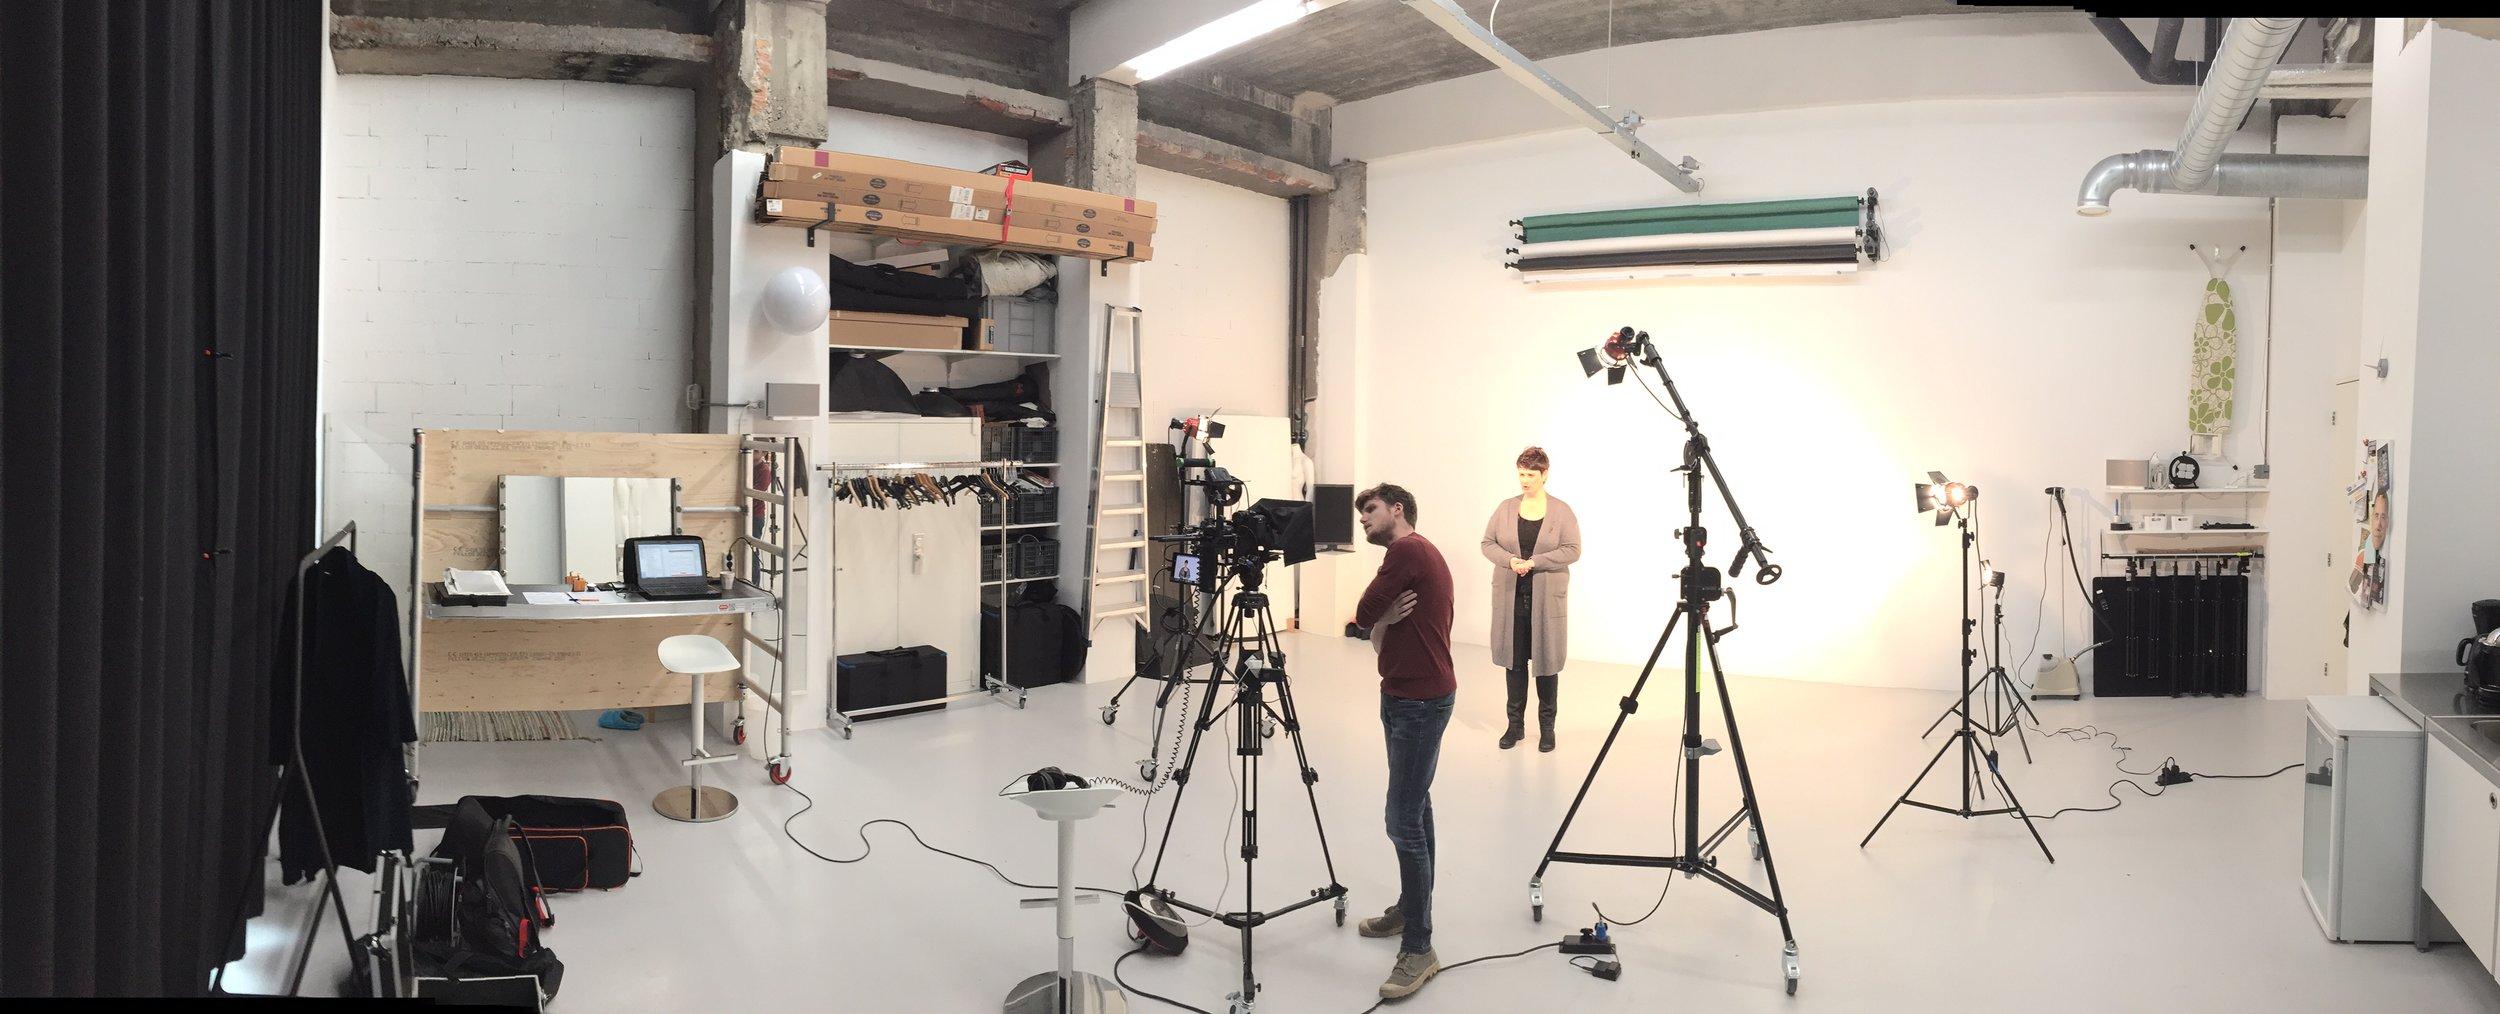 Studio Moos and Spike